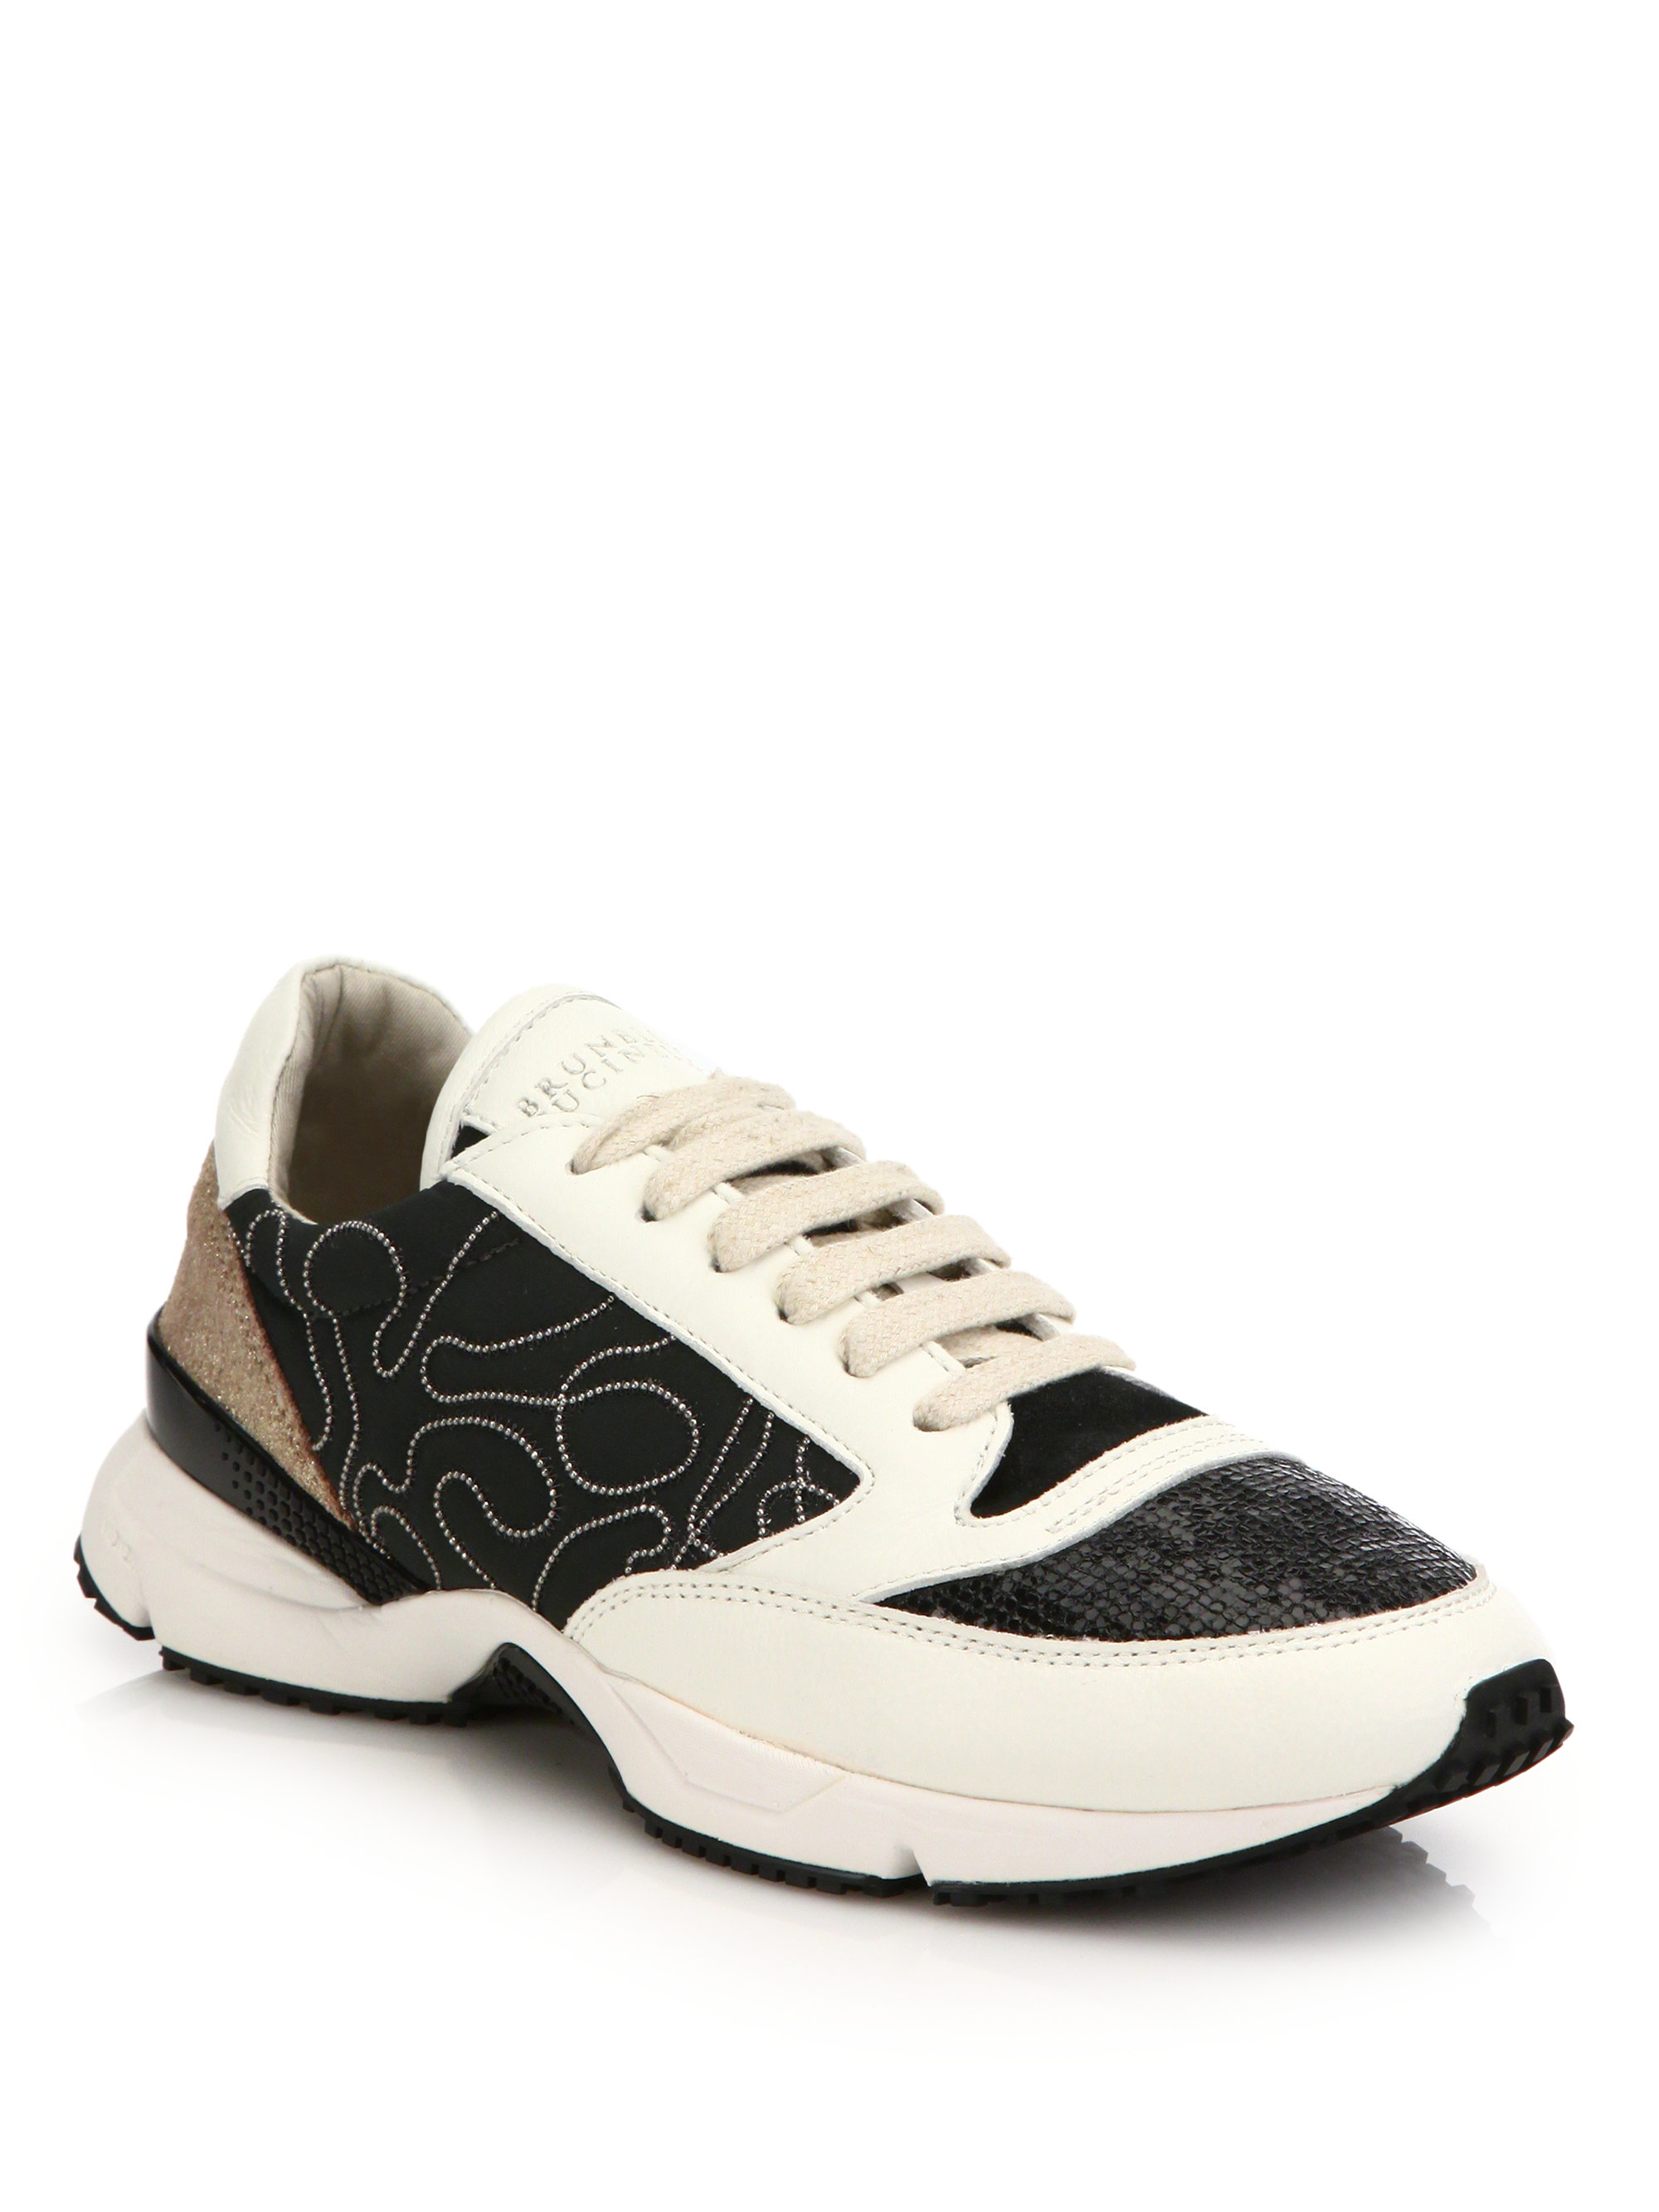 Brunello Cucinelli Glitter Low-Top Sneakers cheap comfortable OX0dzMkh